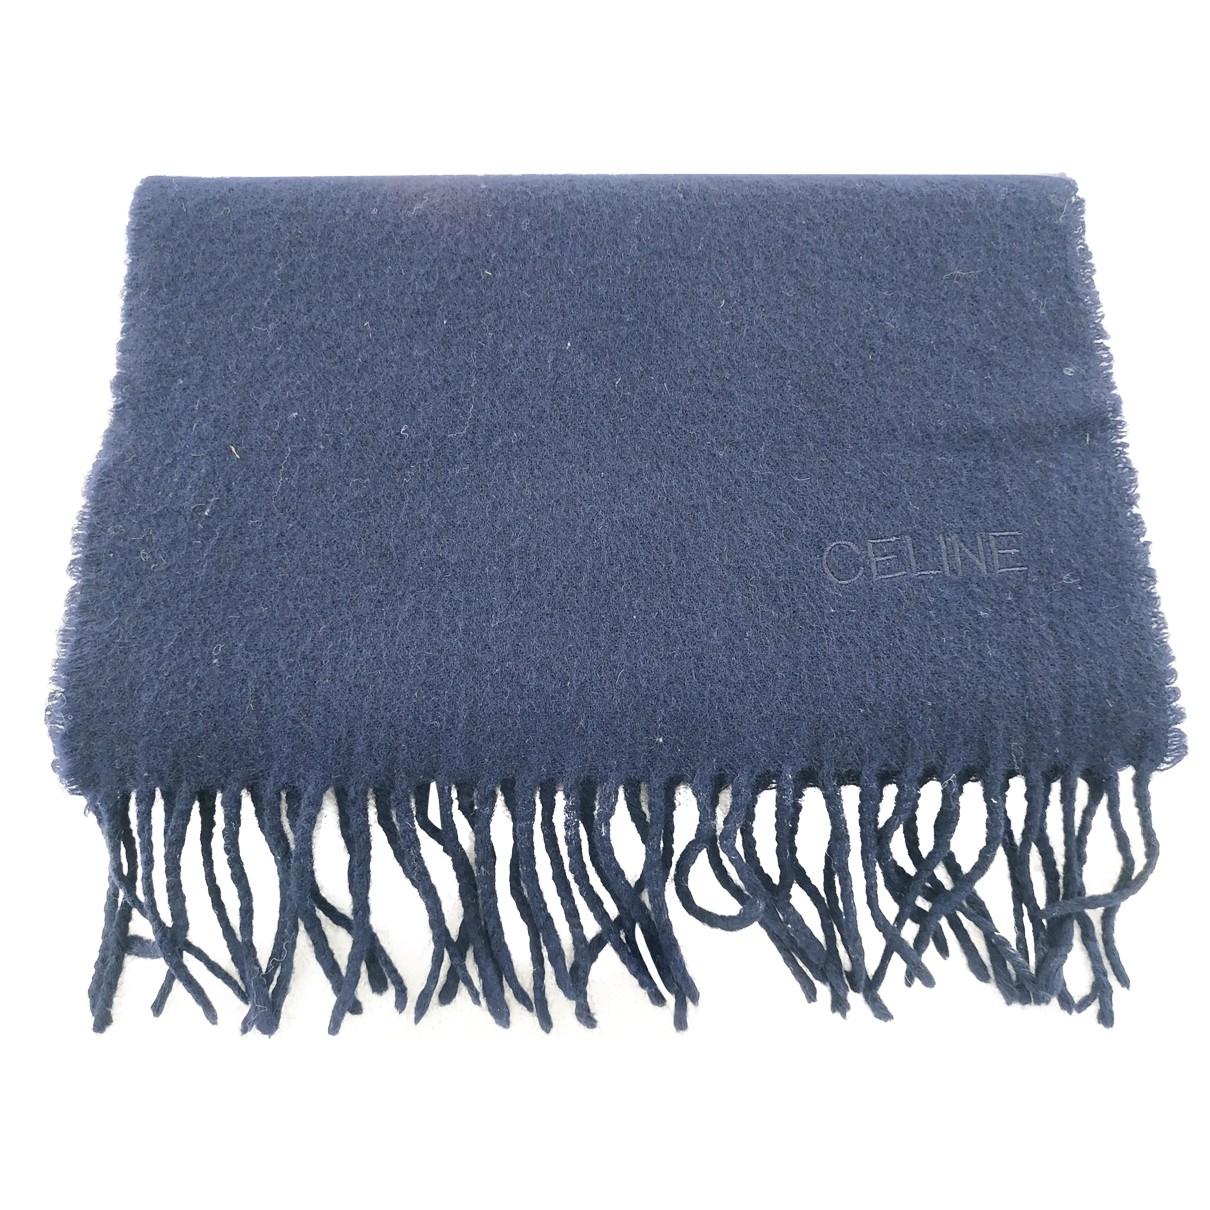 Celine \N Blue Wool scarf for Women \N